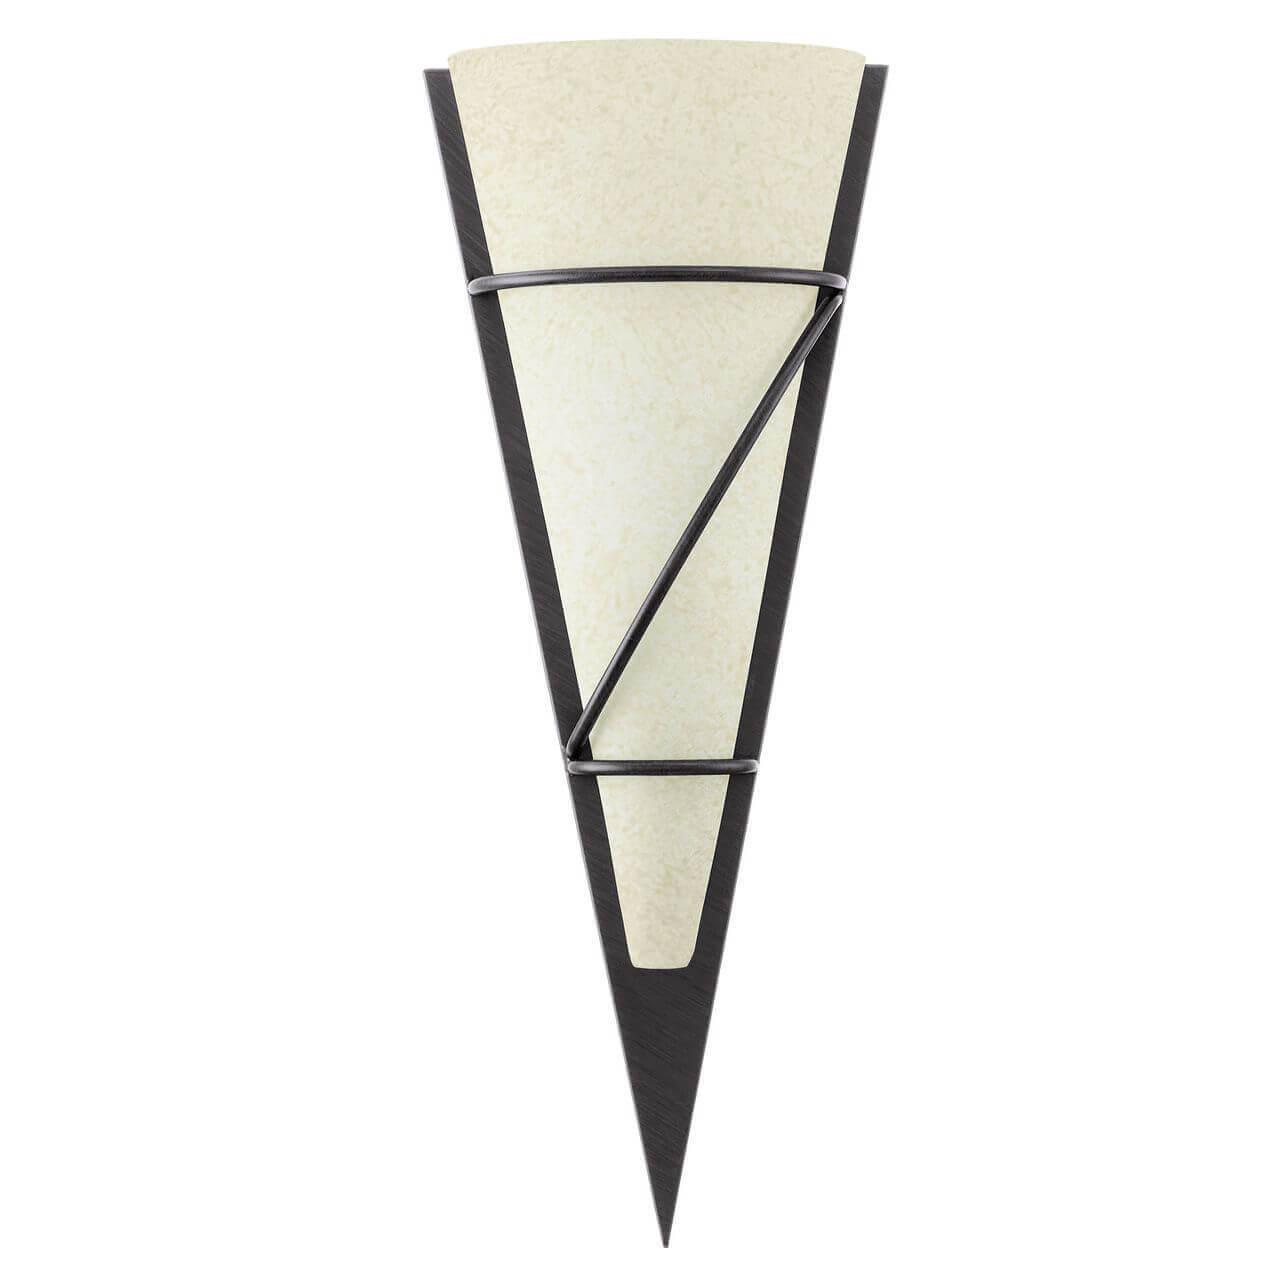 цена на Настенный светильник Eglo Pascal 1 87793